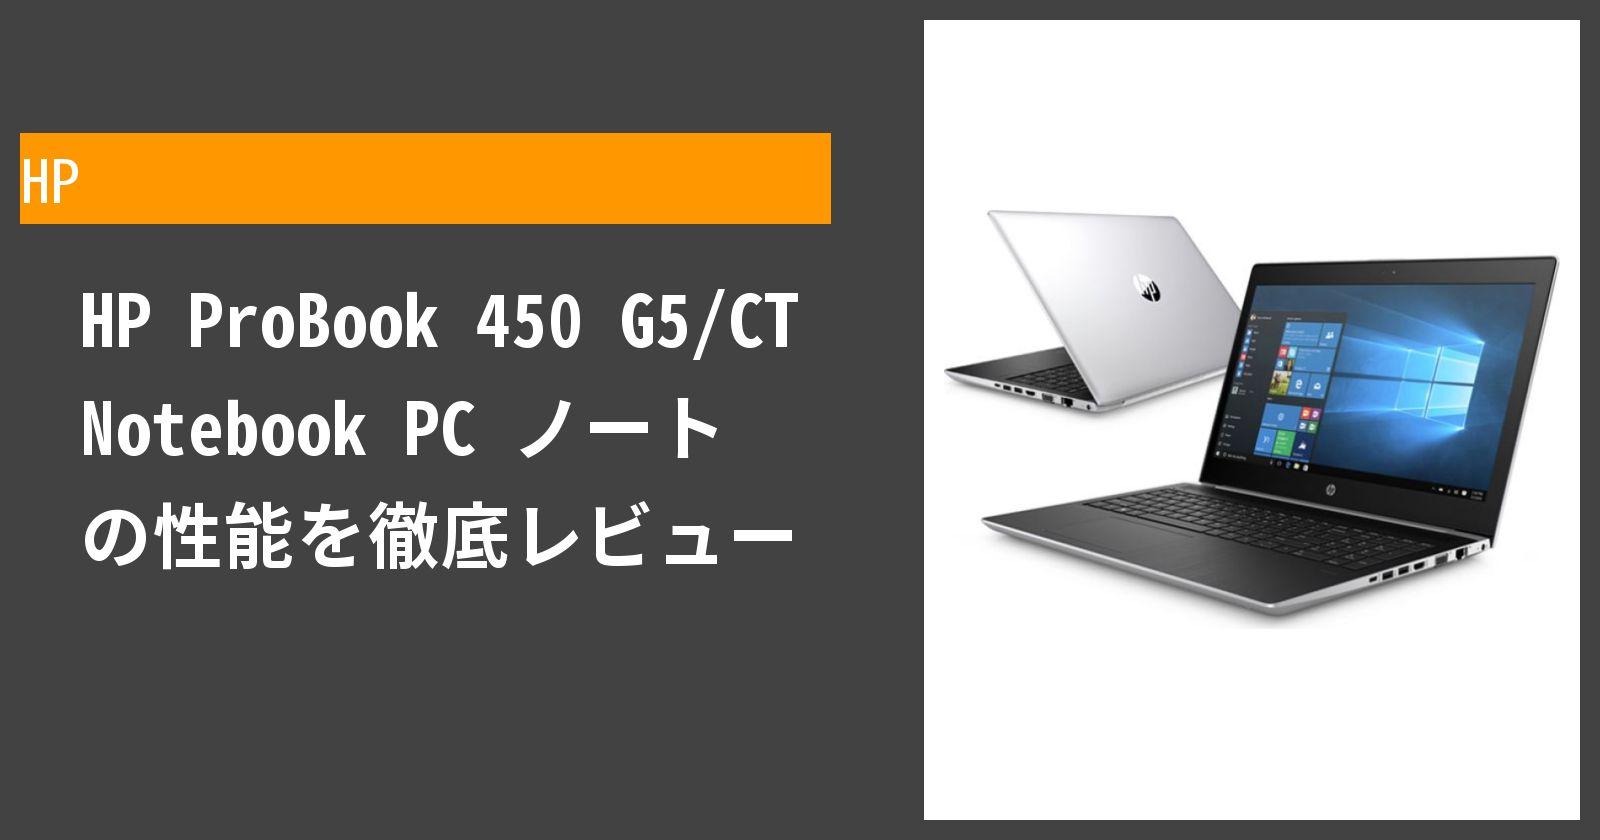 HP ProBook 450 G5/CT の性能を徹底レビュー